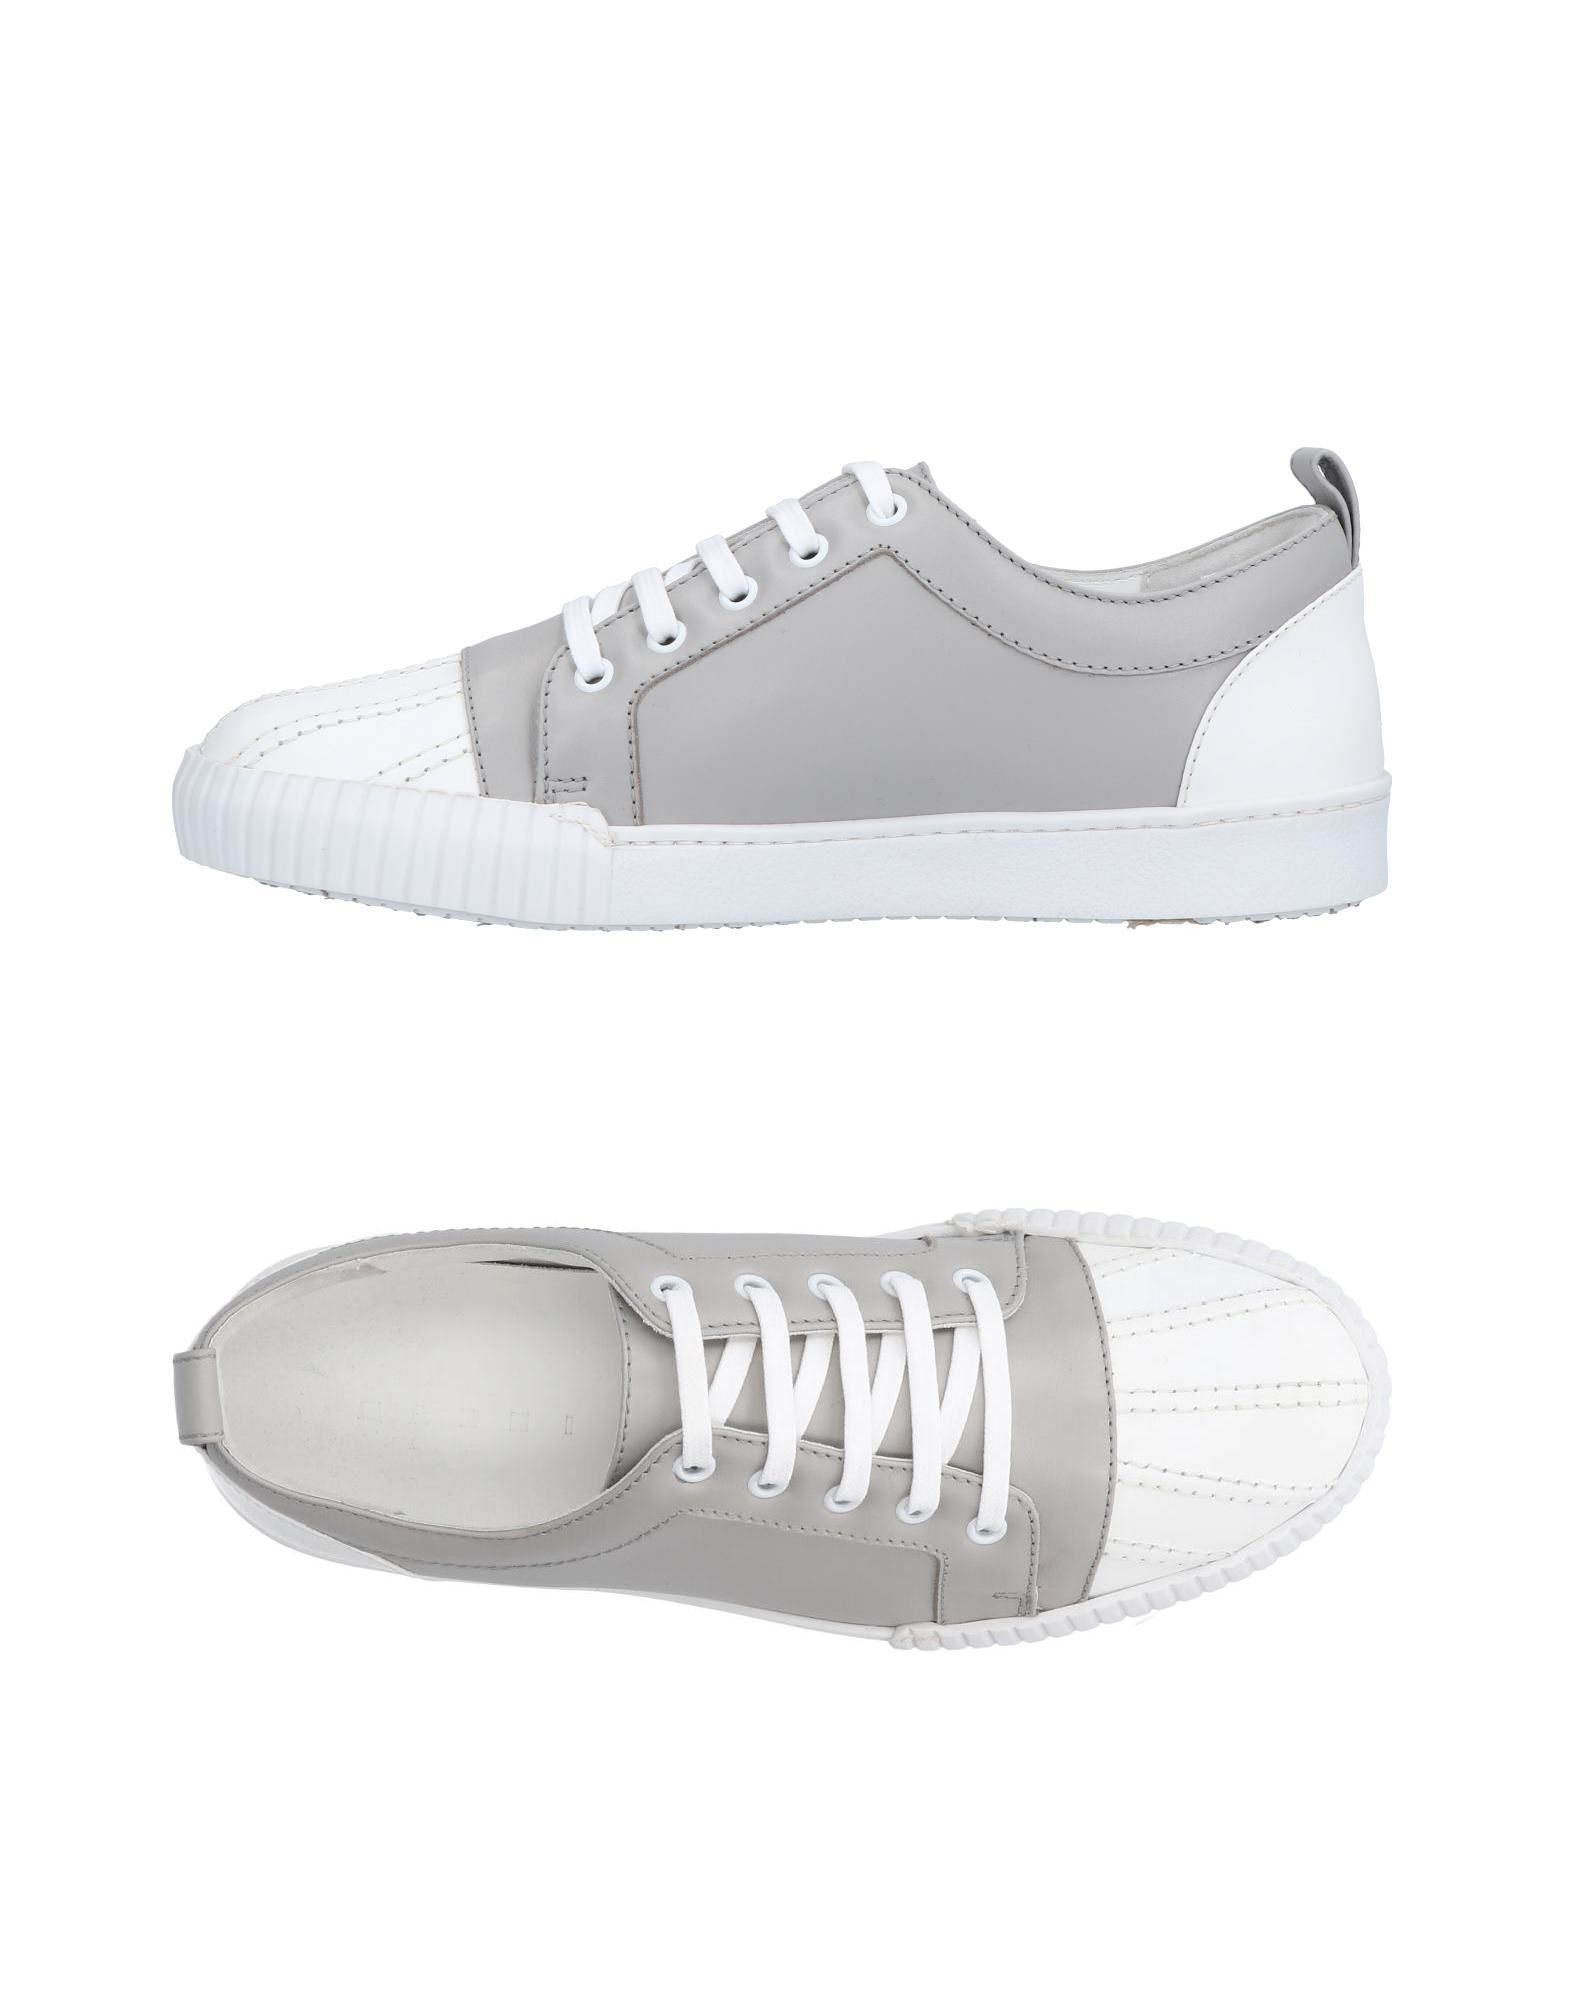 Marni Sneakers Herren  11488977KJ Gute Qualität beliebte Schuhe